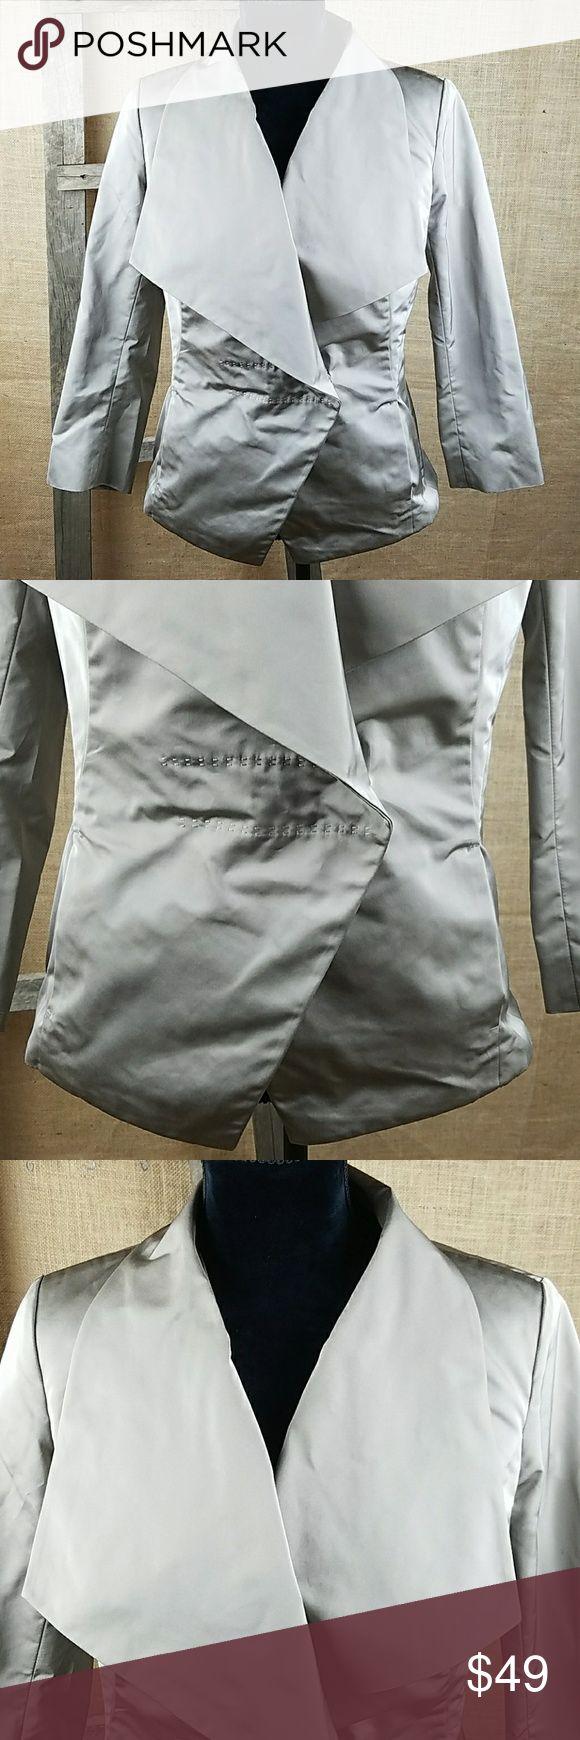 LAFAYETTE 148 women's 6 jacket nylon waxed blazer LAFAYETTE 148 women's 6 jacket nylon blazer. Lafayette 148 New York Jackets & Coats Blazers